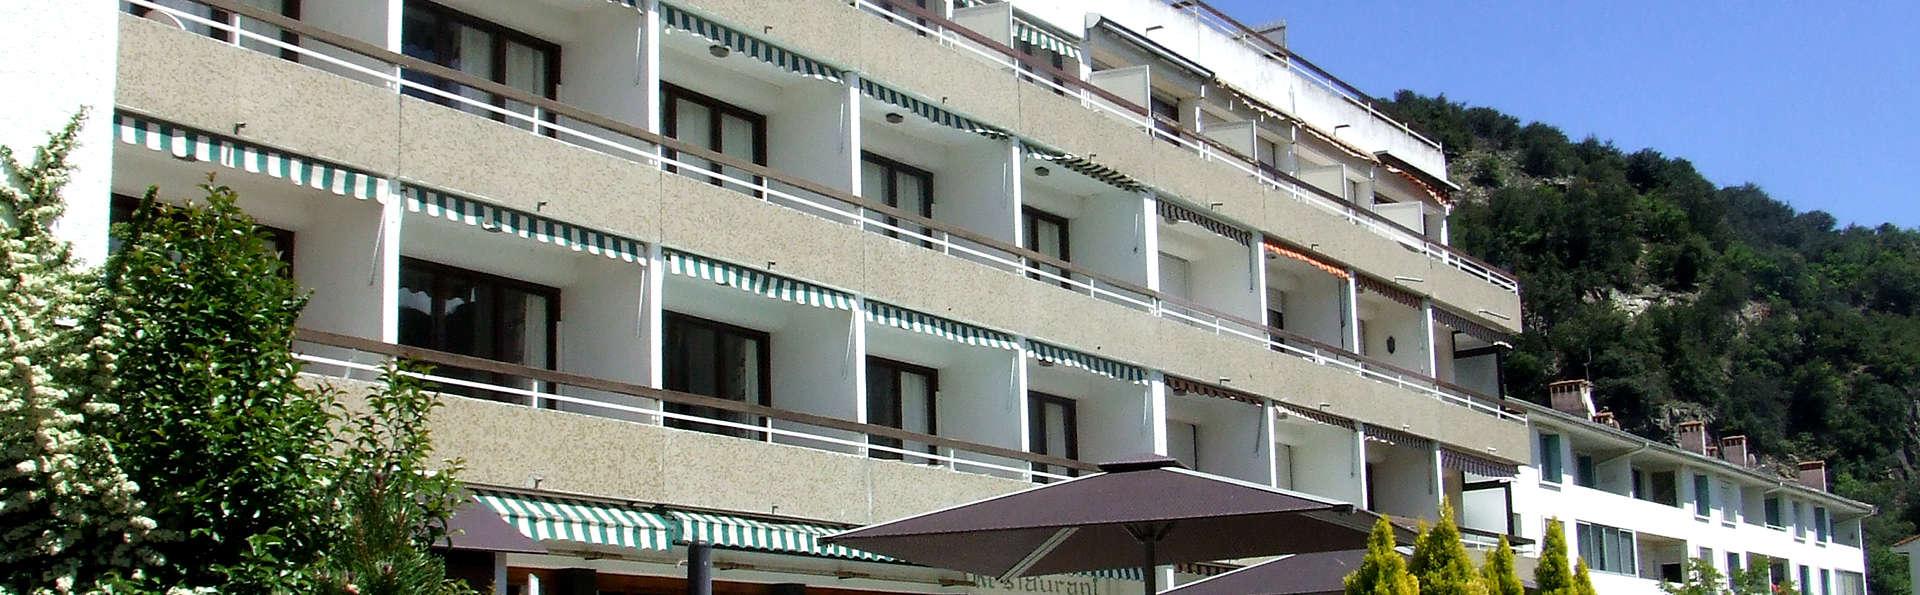 Hôtel Reine Amélie - Edit_Front.jpg